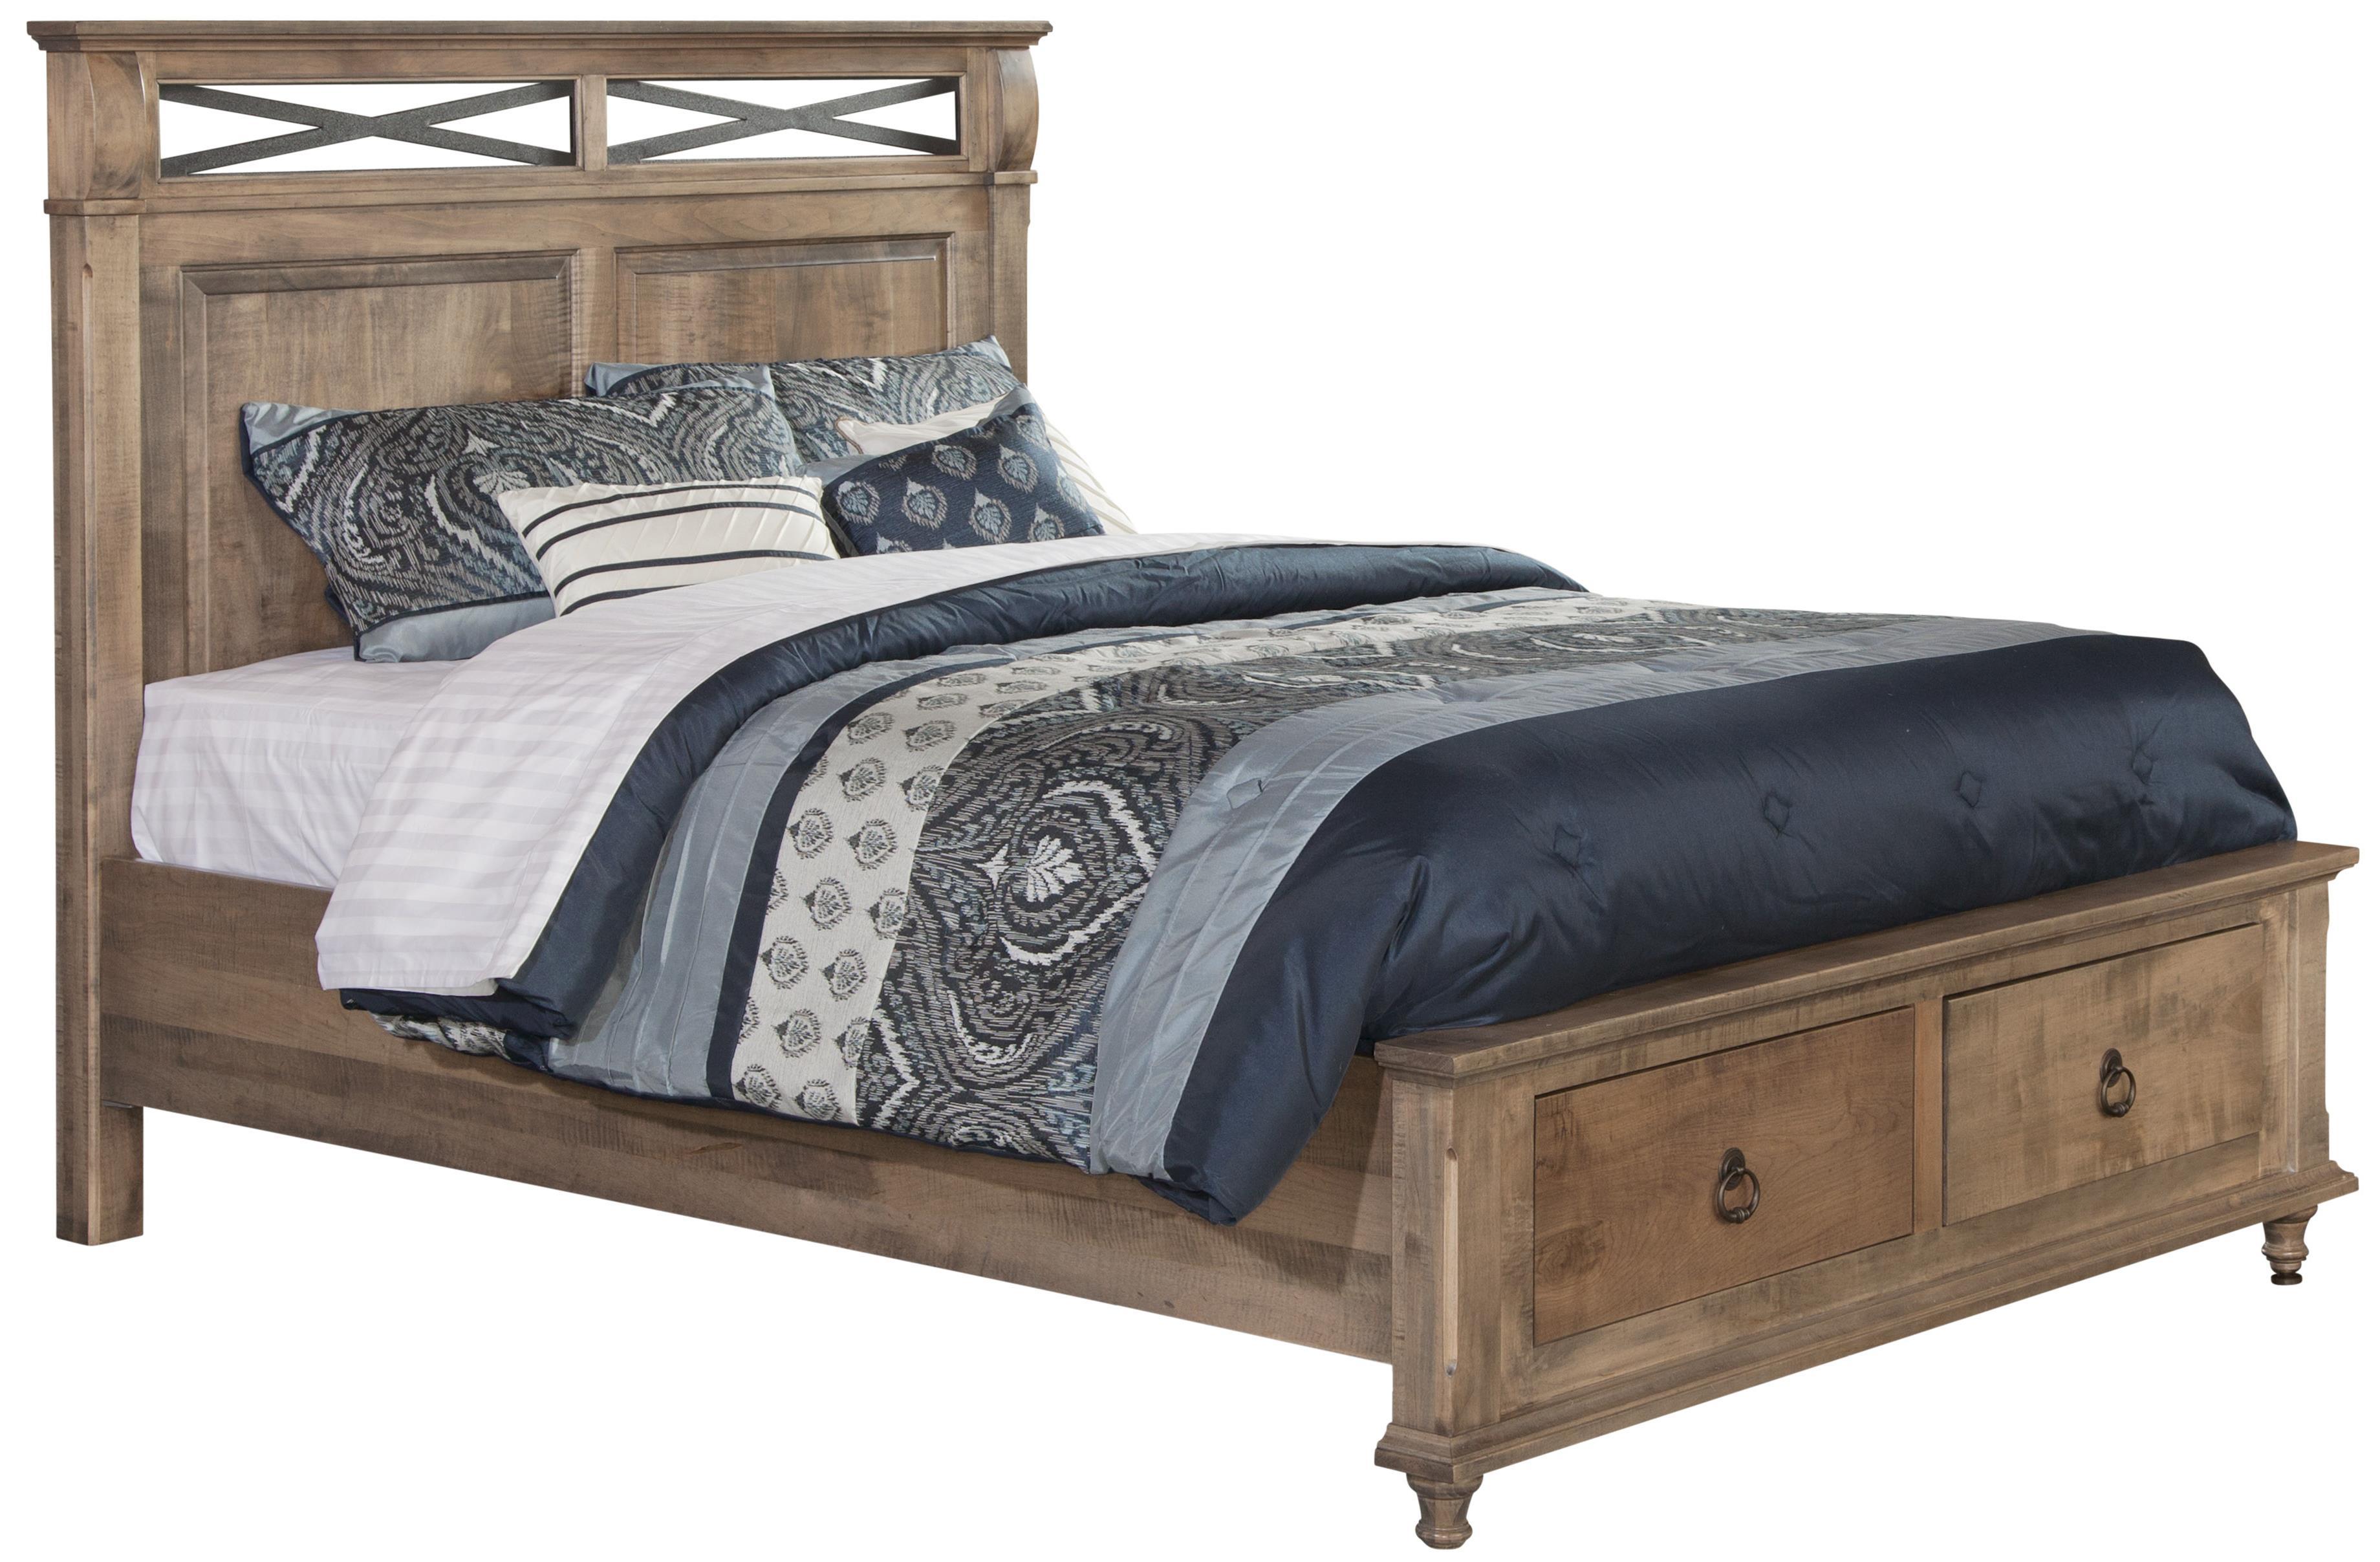 Conrad Grebel Madison King Storage Bed - Item Number: XD2541HB+DFB+FR